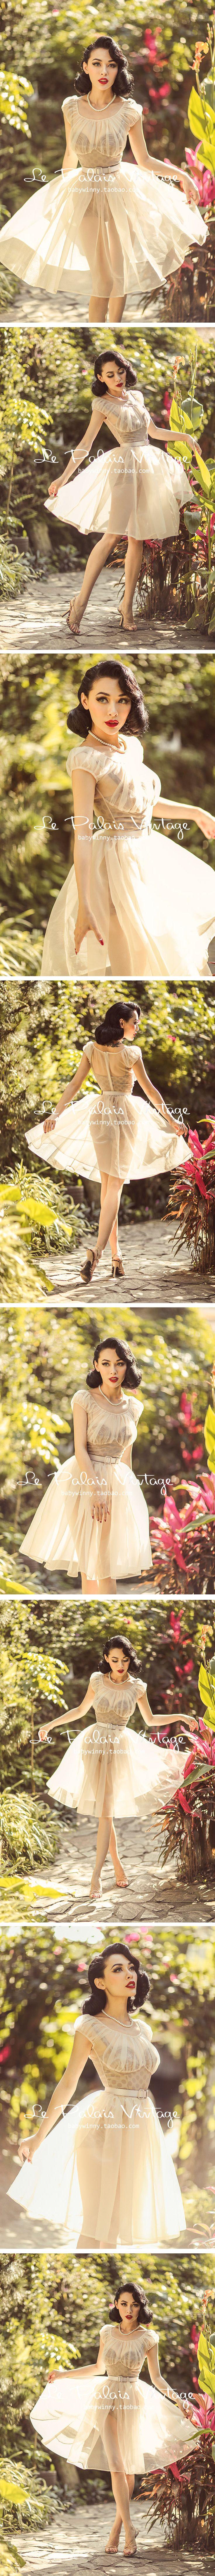 le palais vintage retro elegant limited perspective nude fairy tutu corset suit 0.25-Taobao